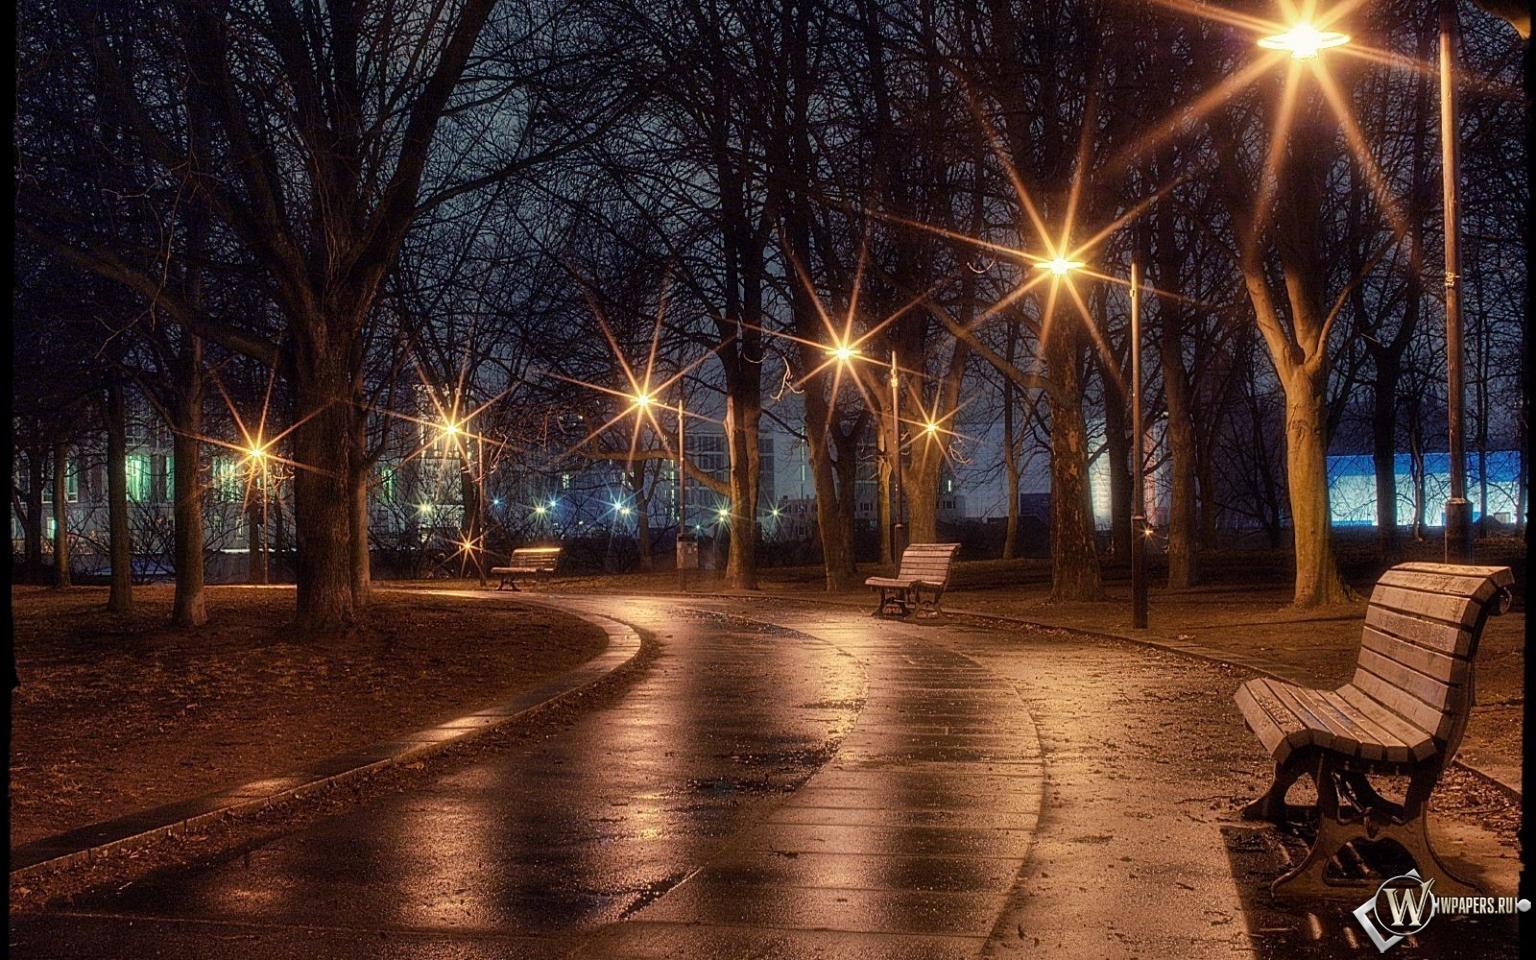 Ночная аллея 1536x960